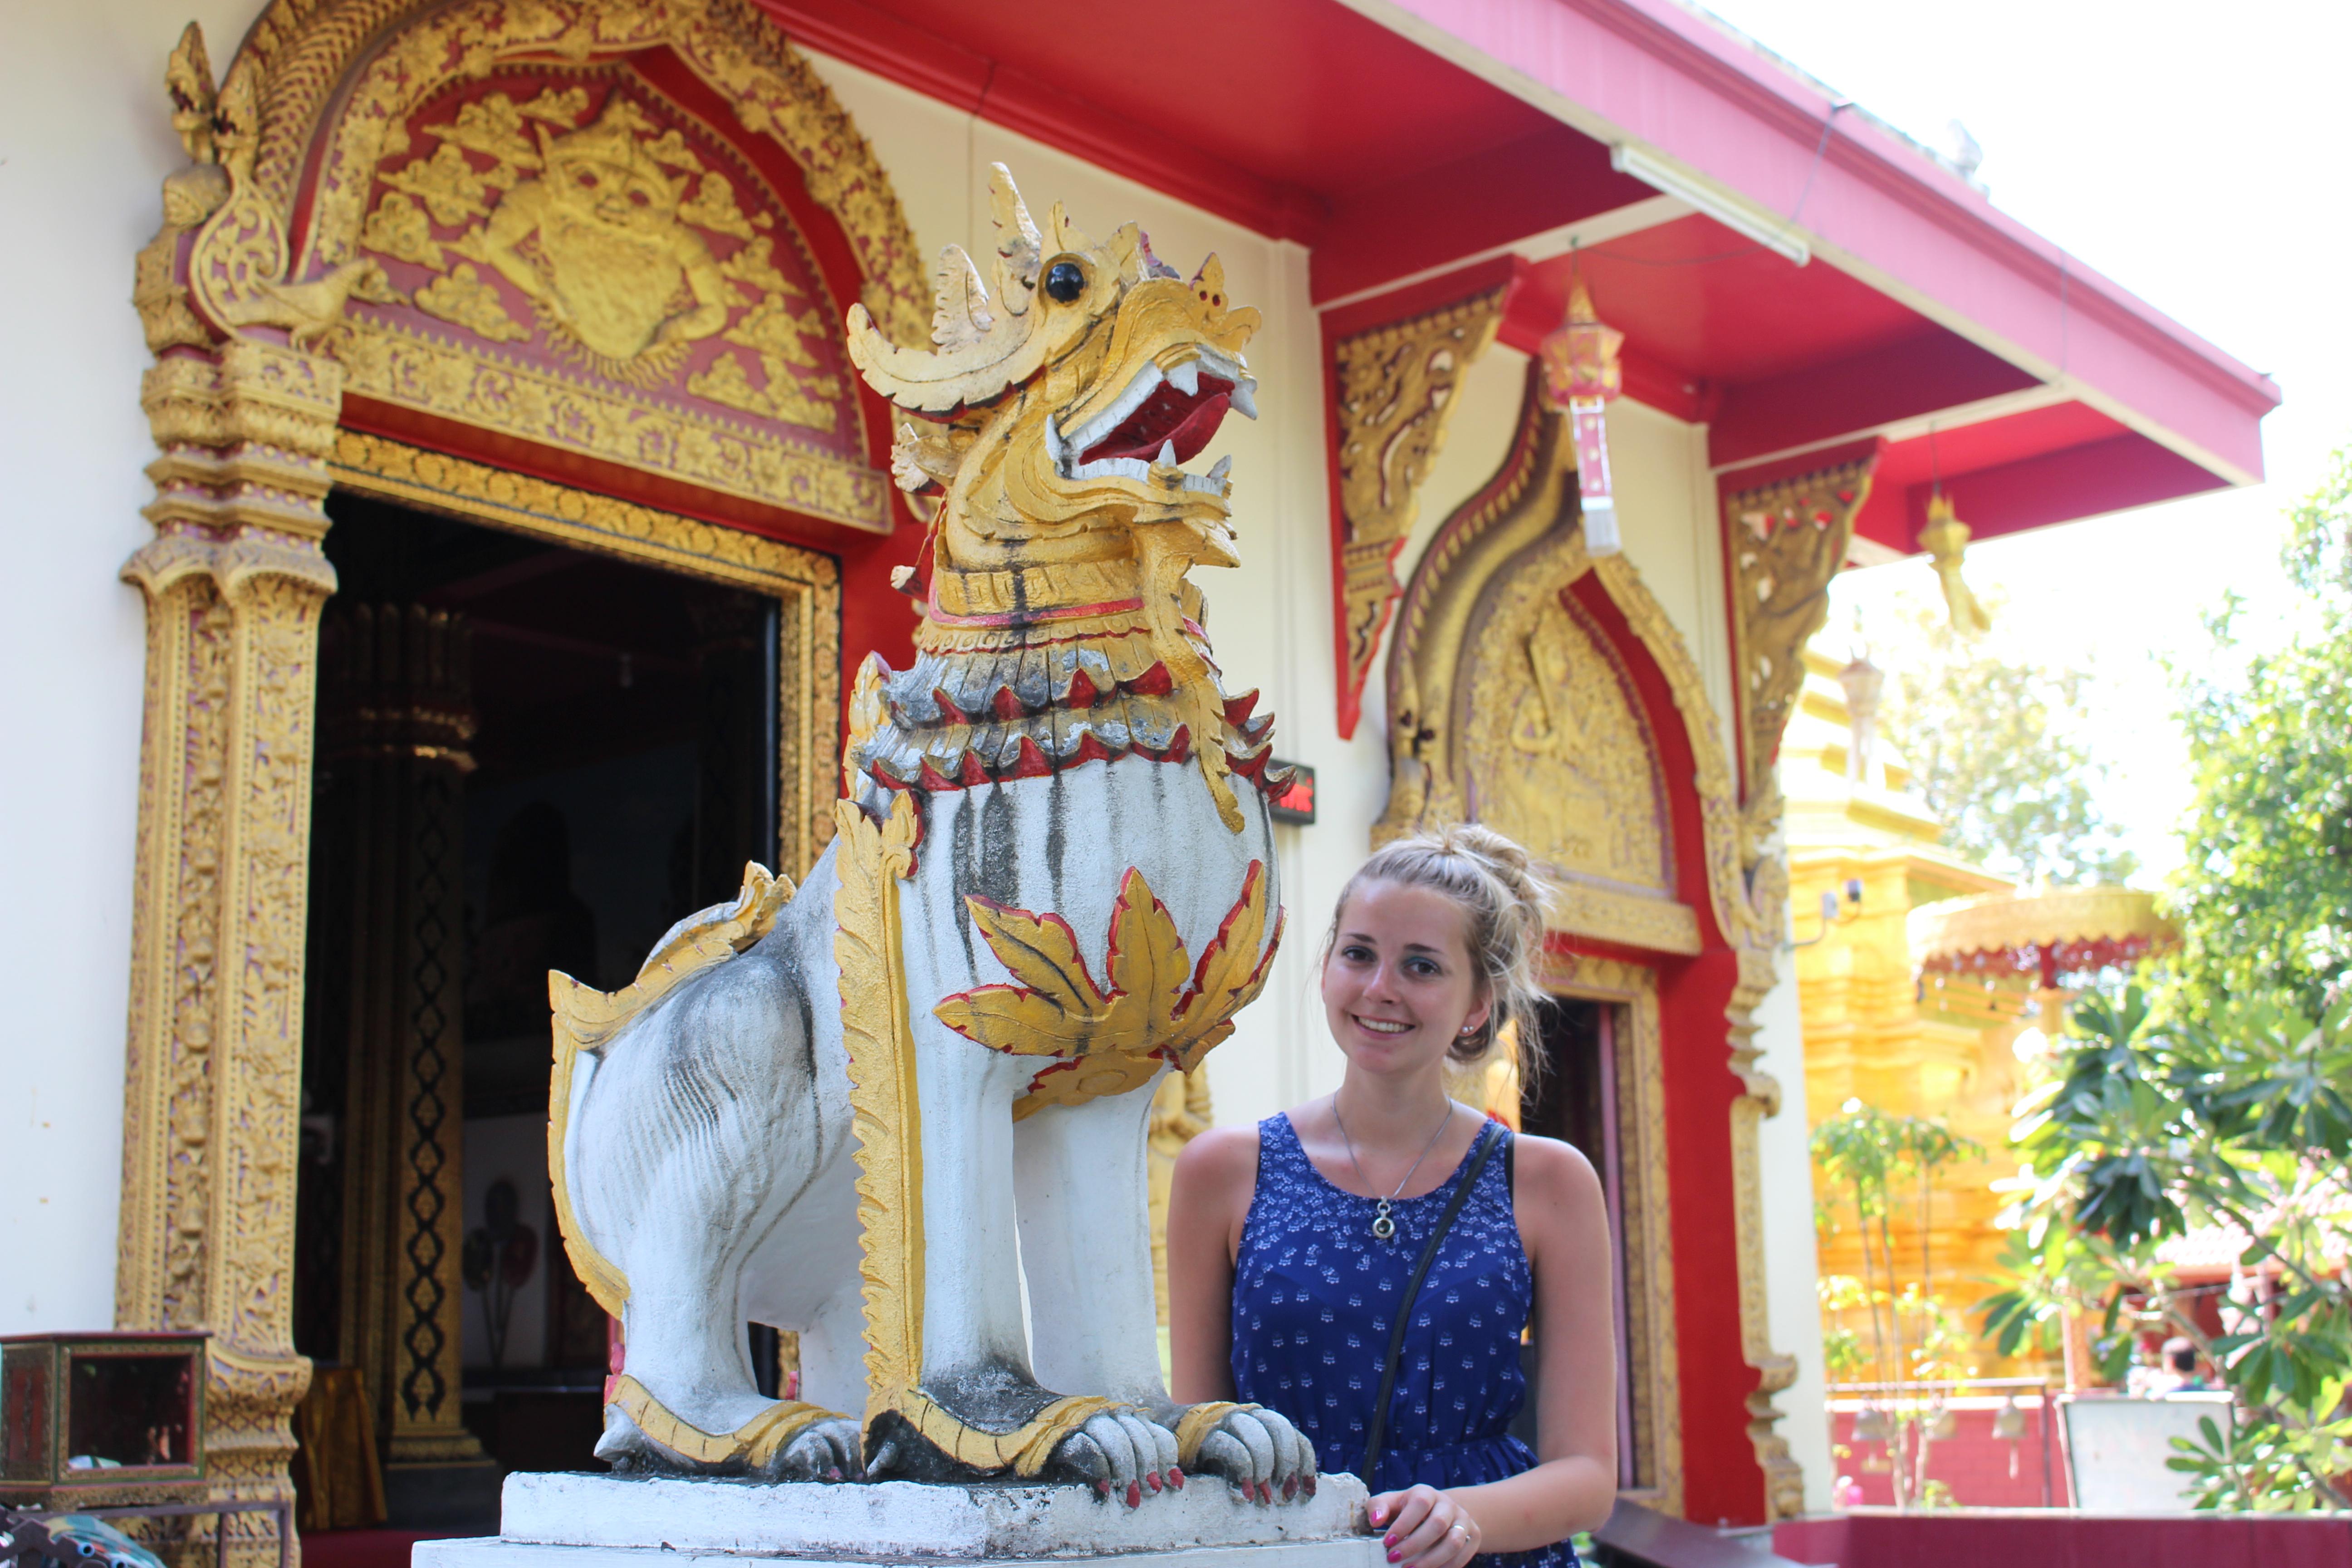 Reisdagboek Thailand #2 – Ayutthaya, Lampang & Chiang Mai